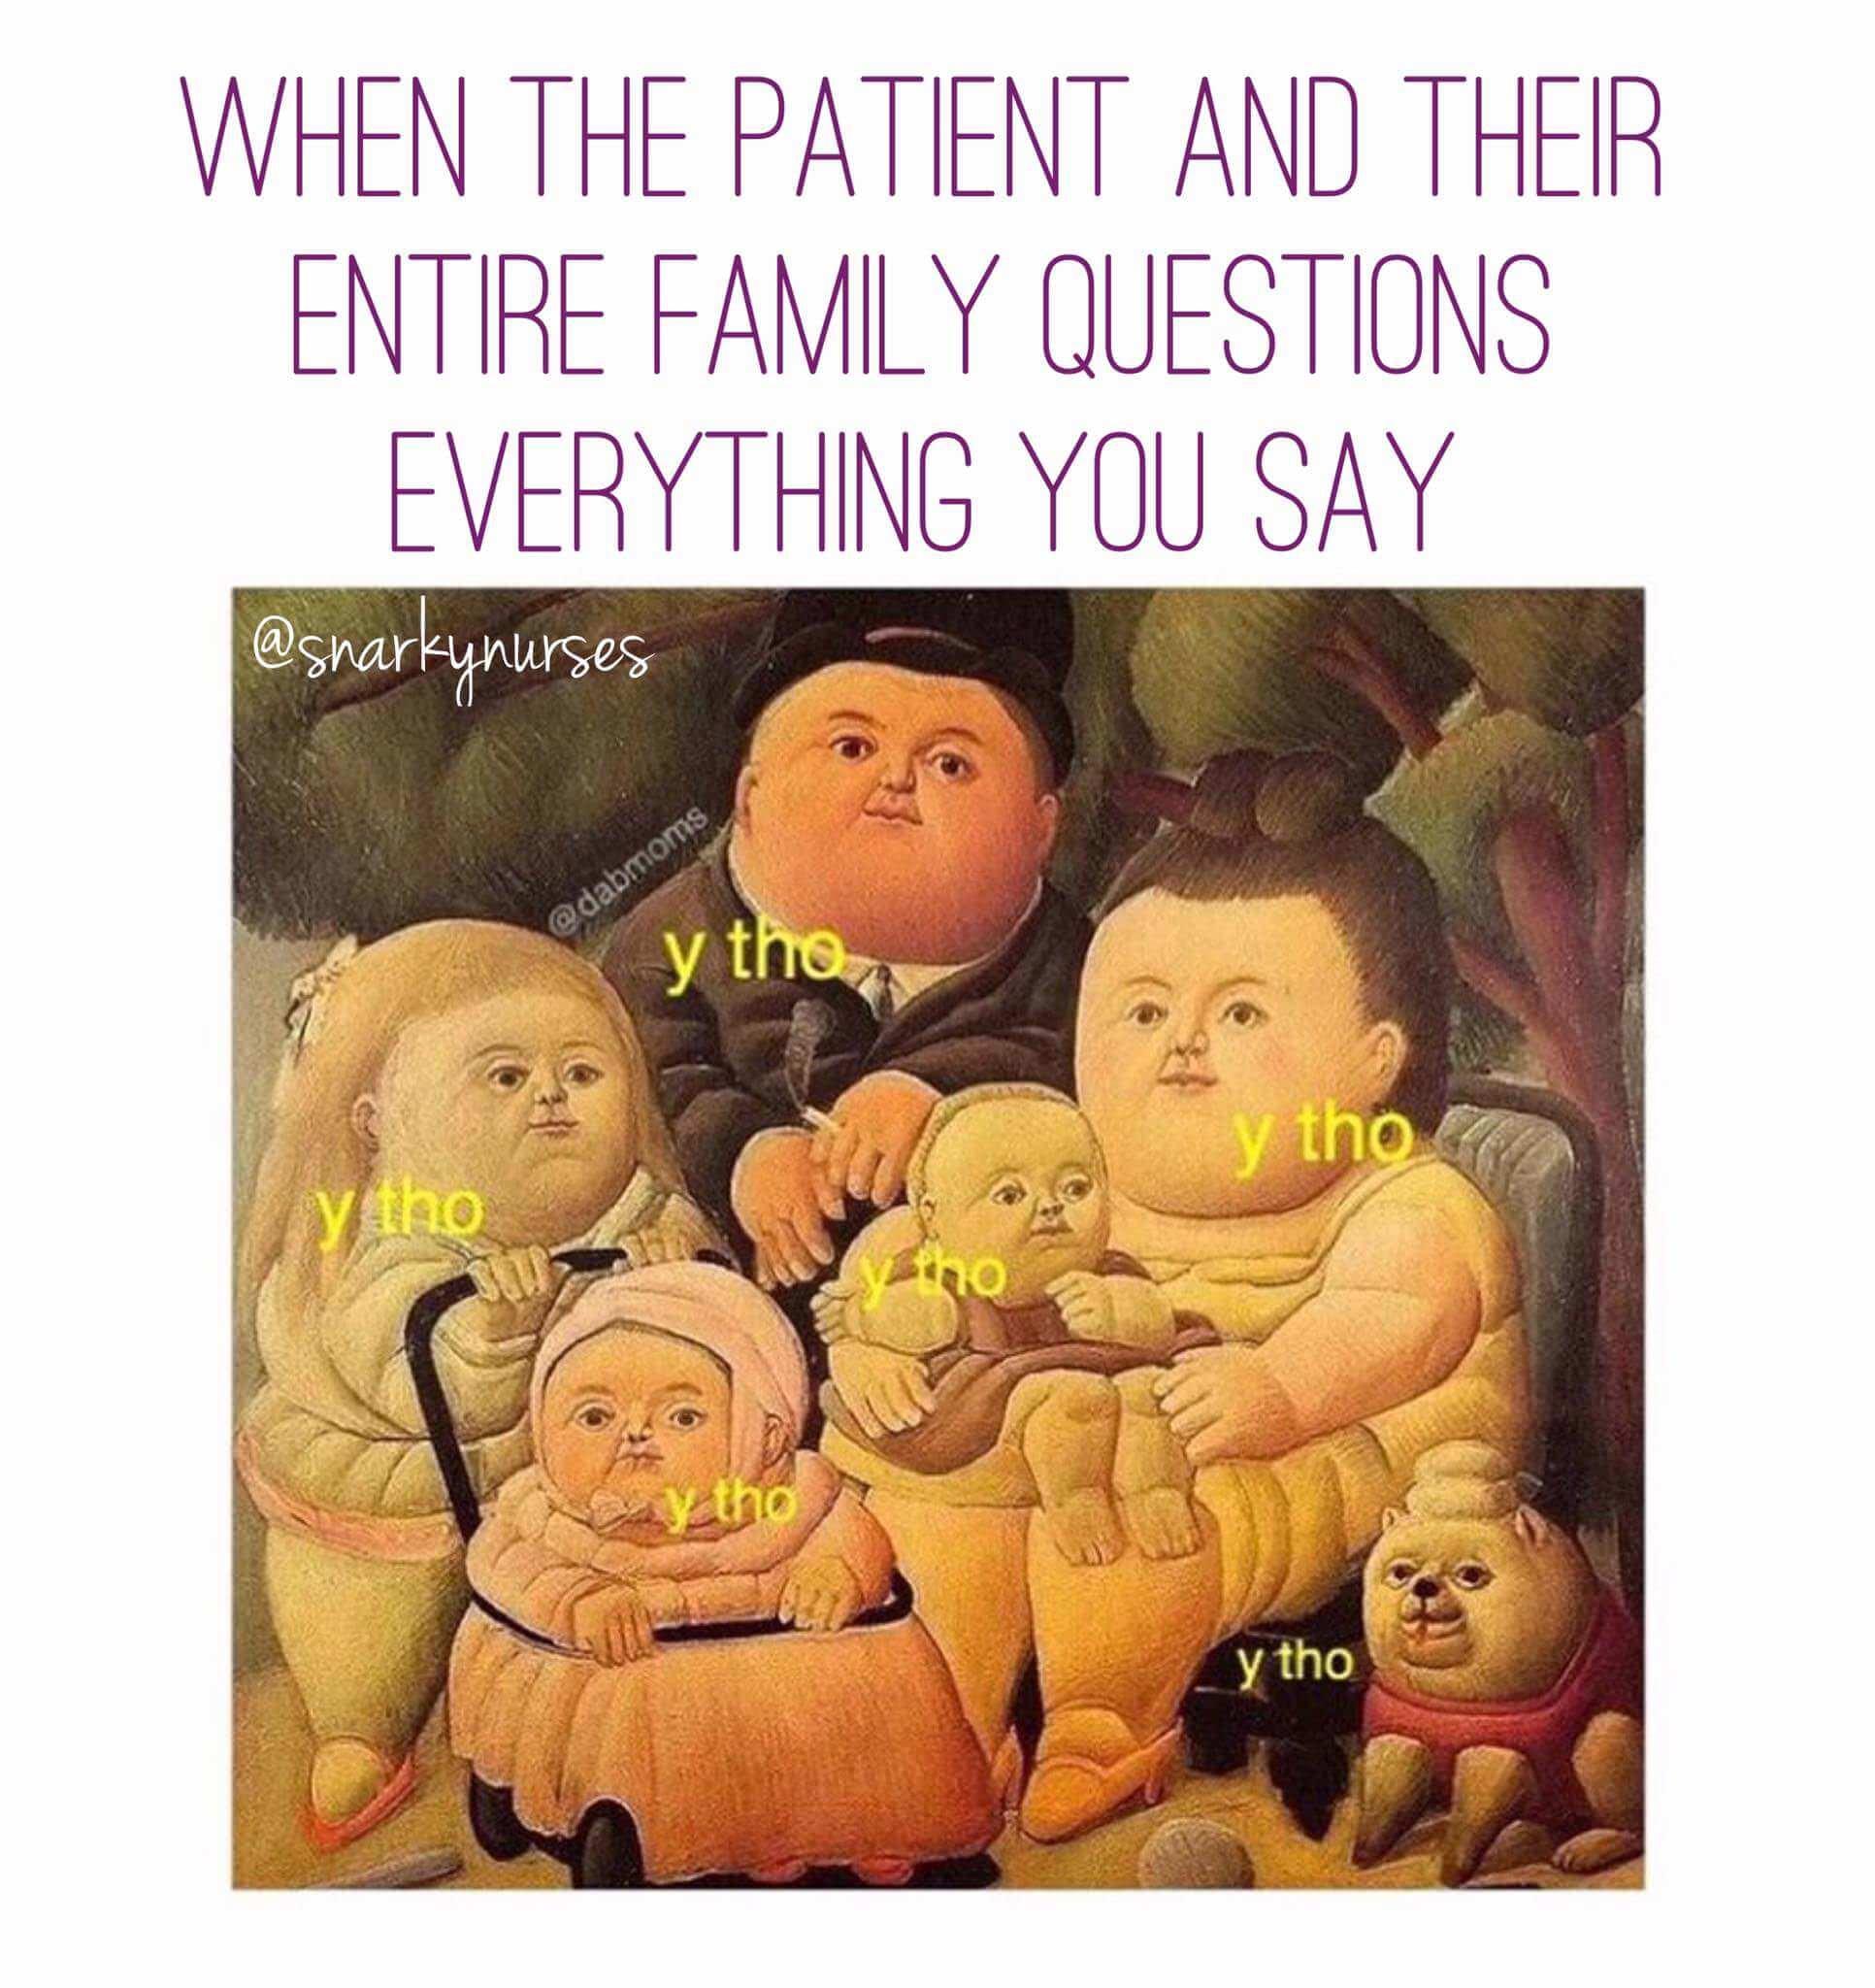 nurse school memes 26 (1)